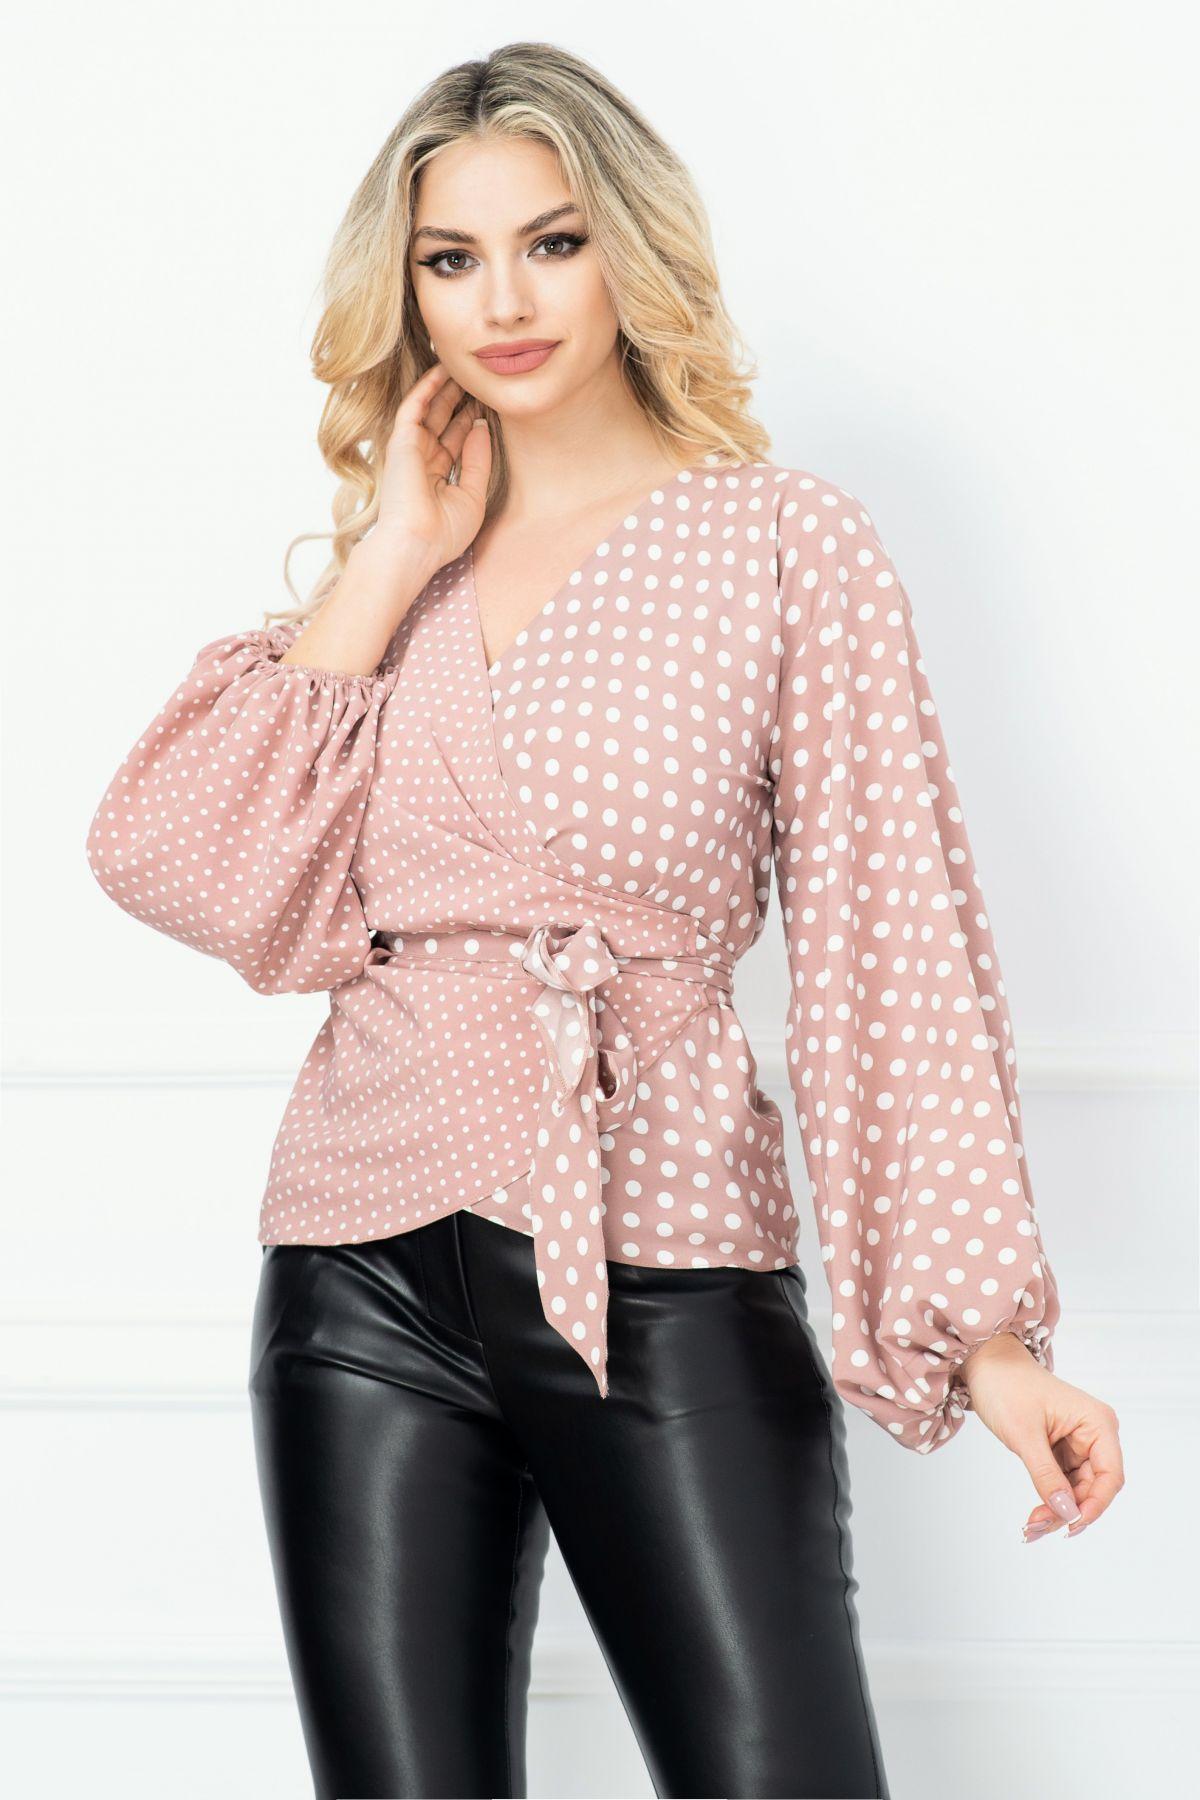 Bluza Effect roz prafuit din bumbac cu buline petrecuta